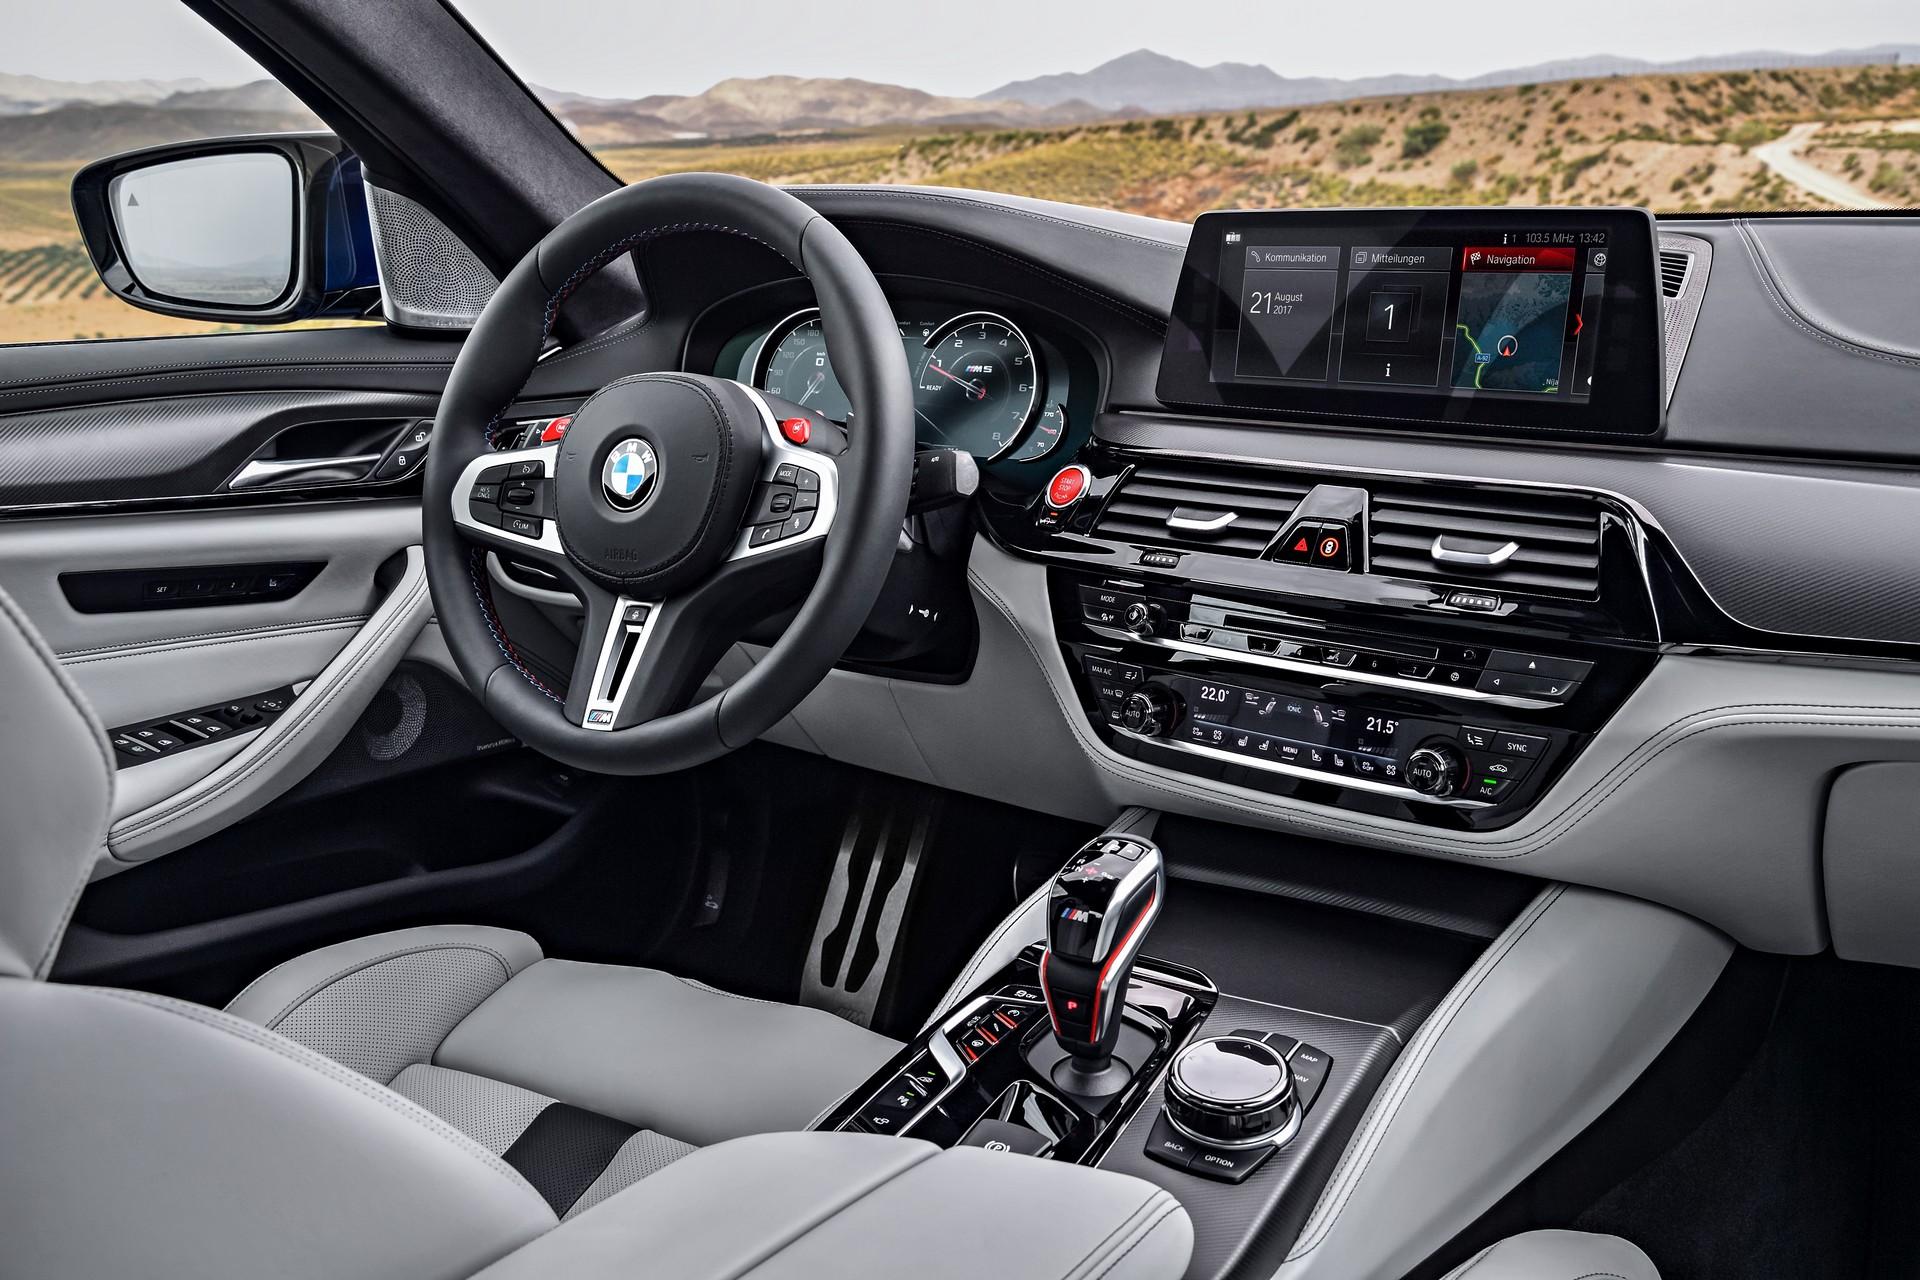 BMW M5 interni